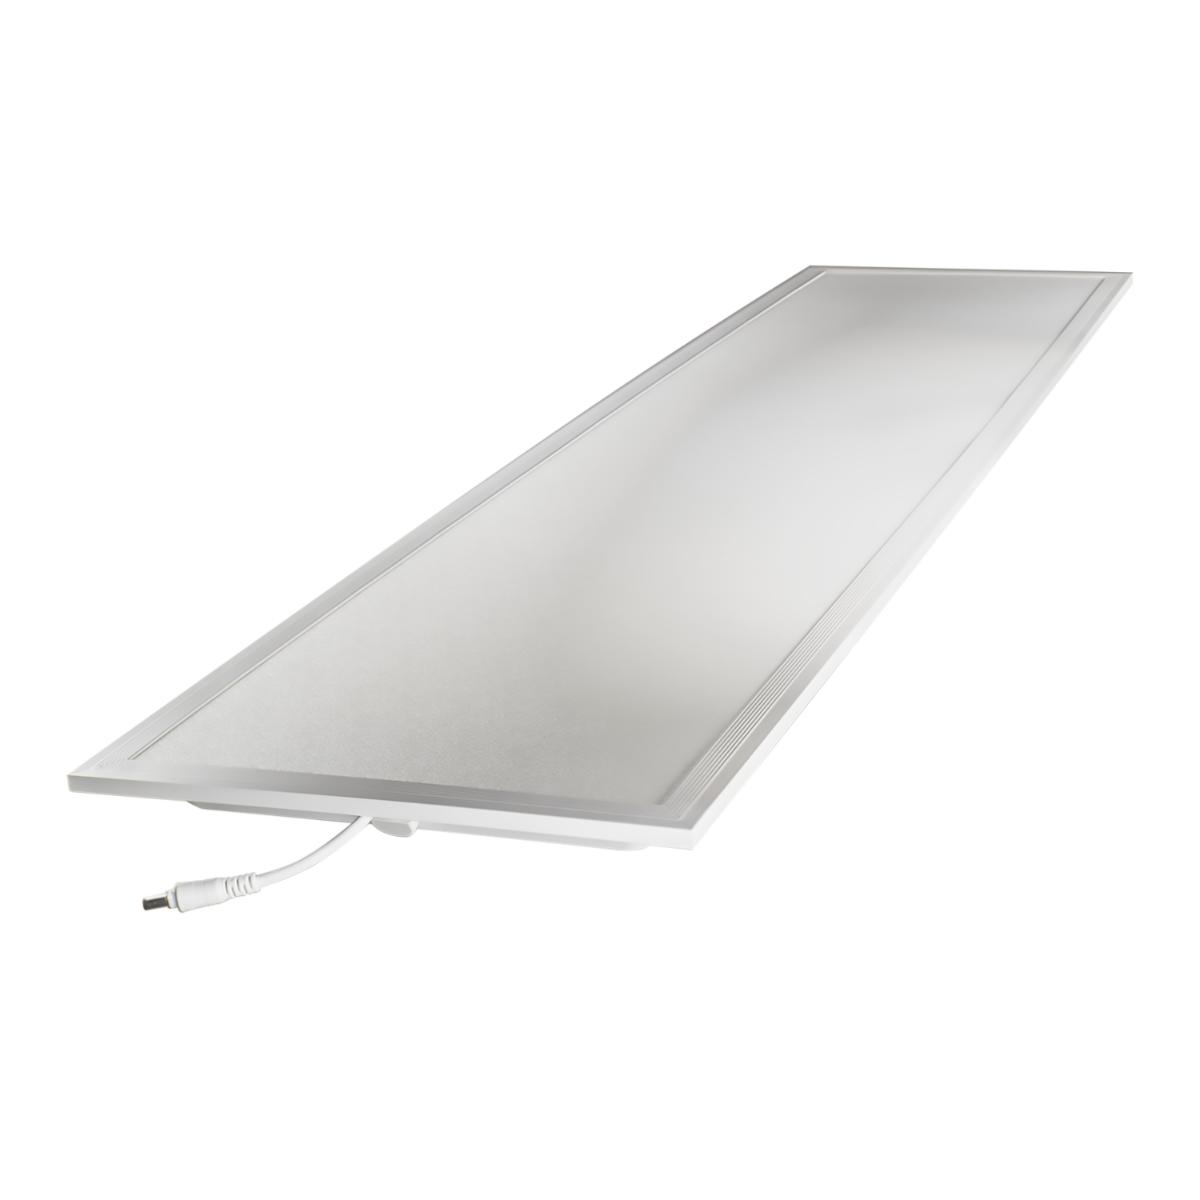 Noxion LED Paneeli Delta Pro Highlum V2.0 Xitanium DALI 40W 30x120cm 6500K 5480lm UGR <19   Dali Himmennettävä - Päivänvalo Valkoinen - Korvaa 2x36W